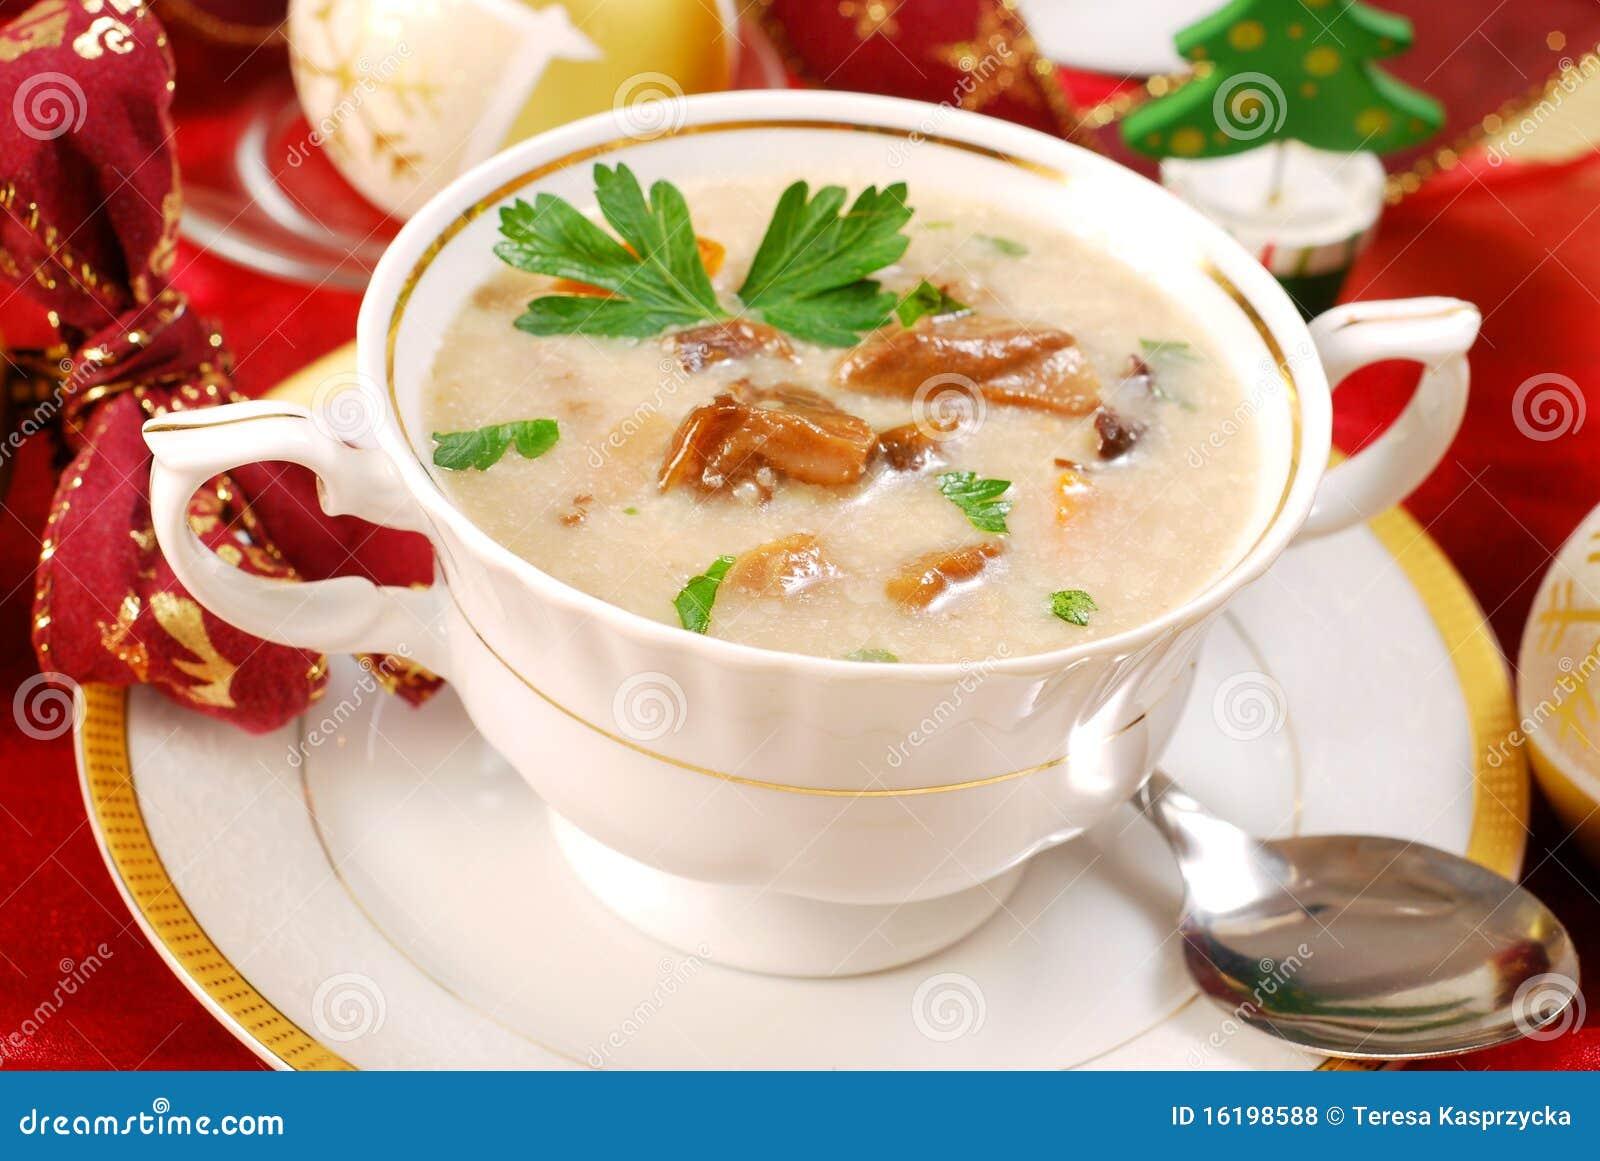 Sopa de cogumelo com creme para o Natal